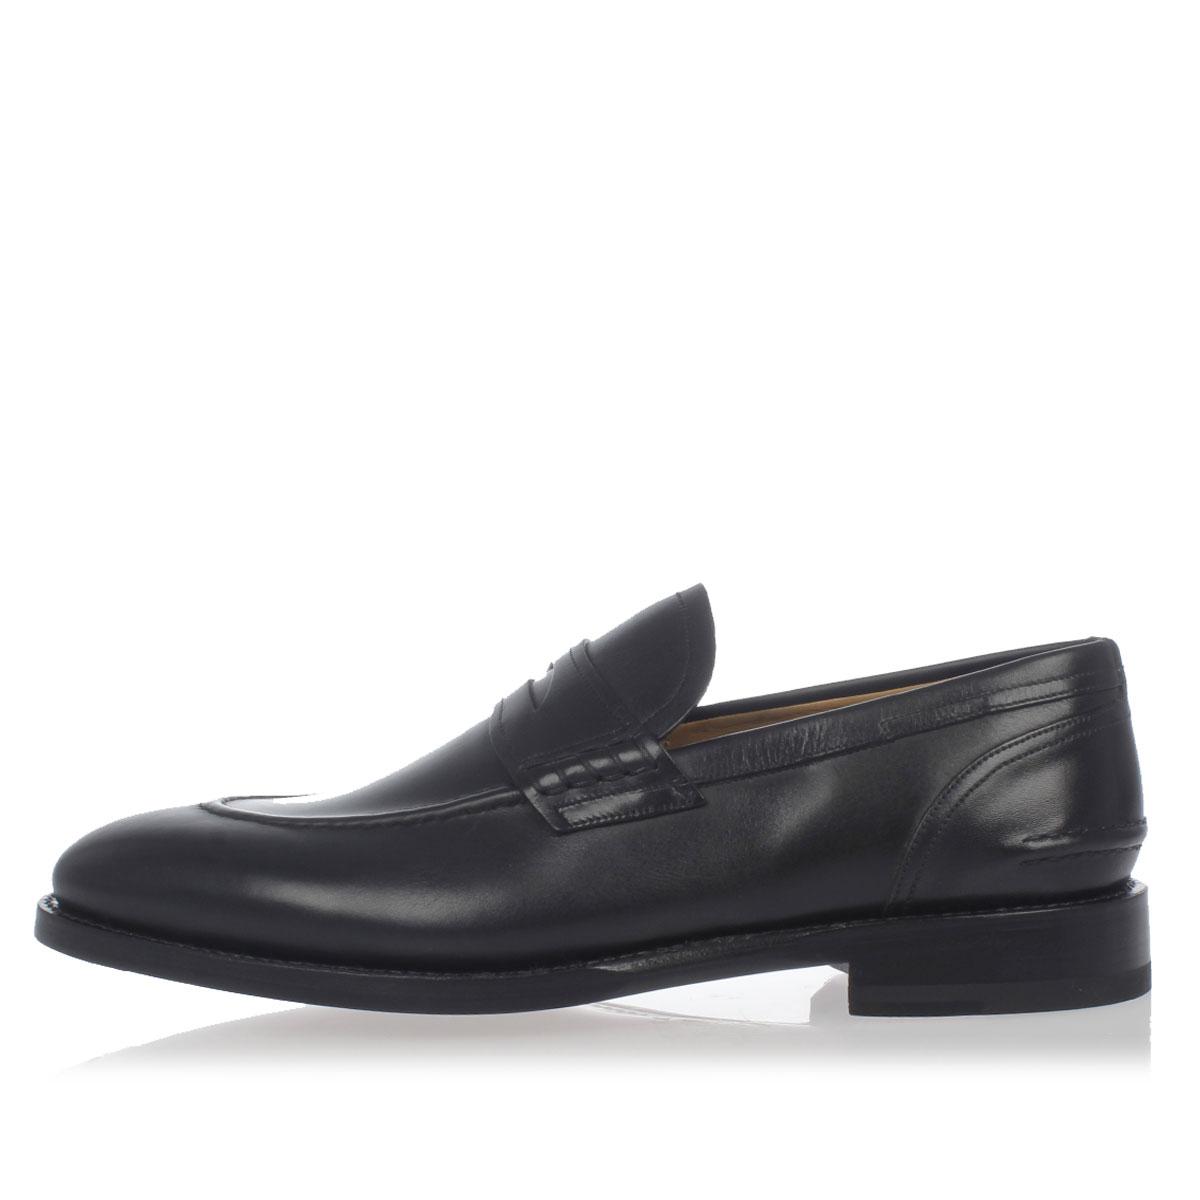 Bally Shoes Amazon Store